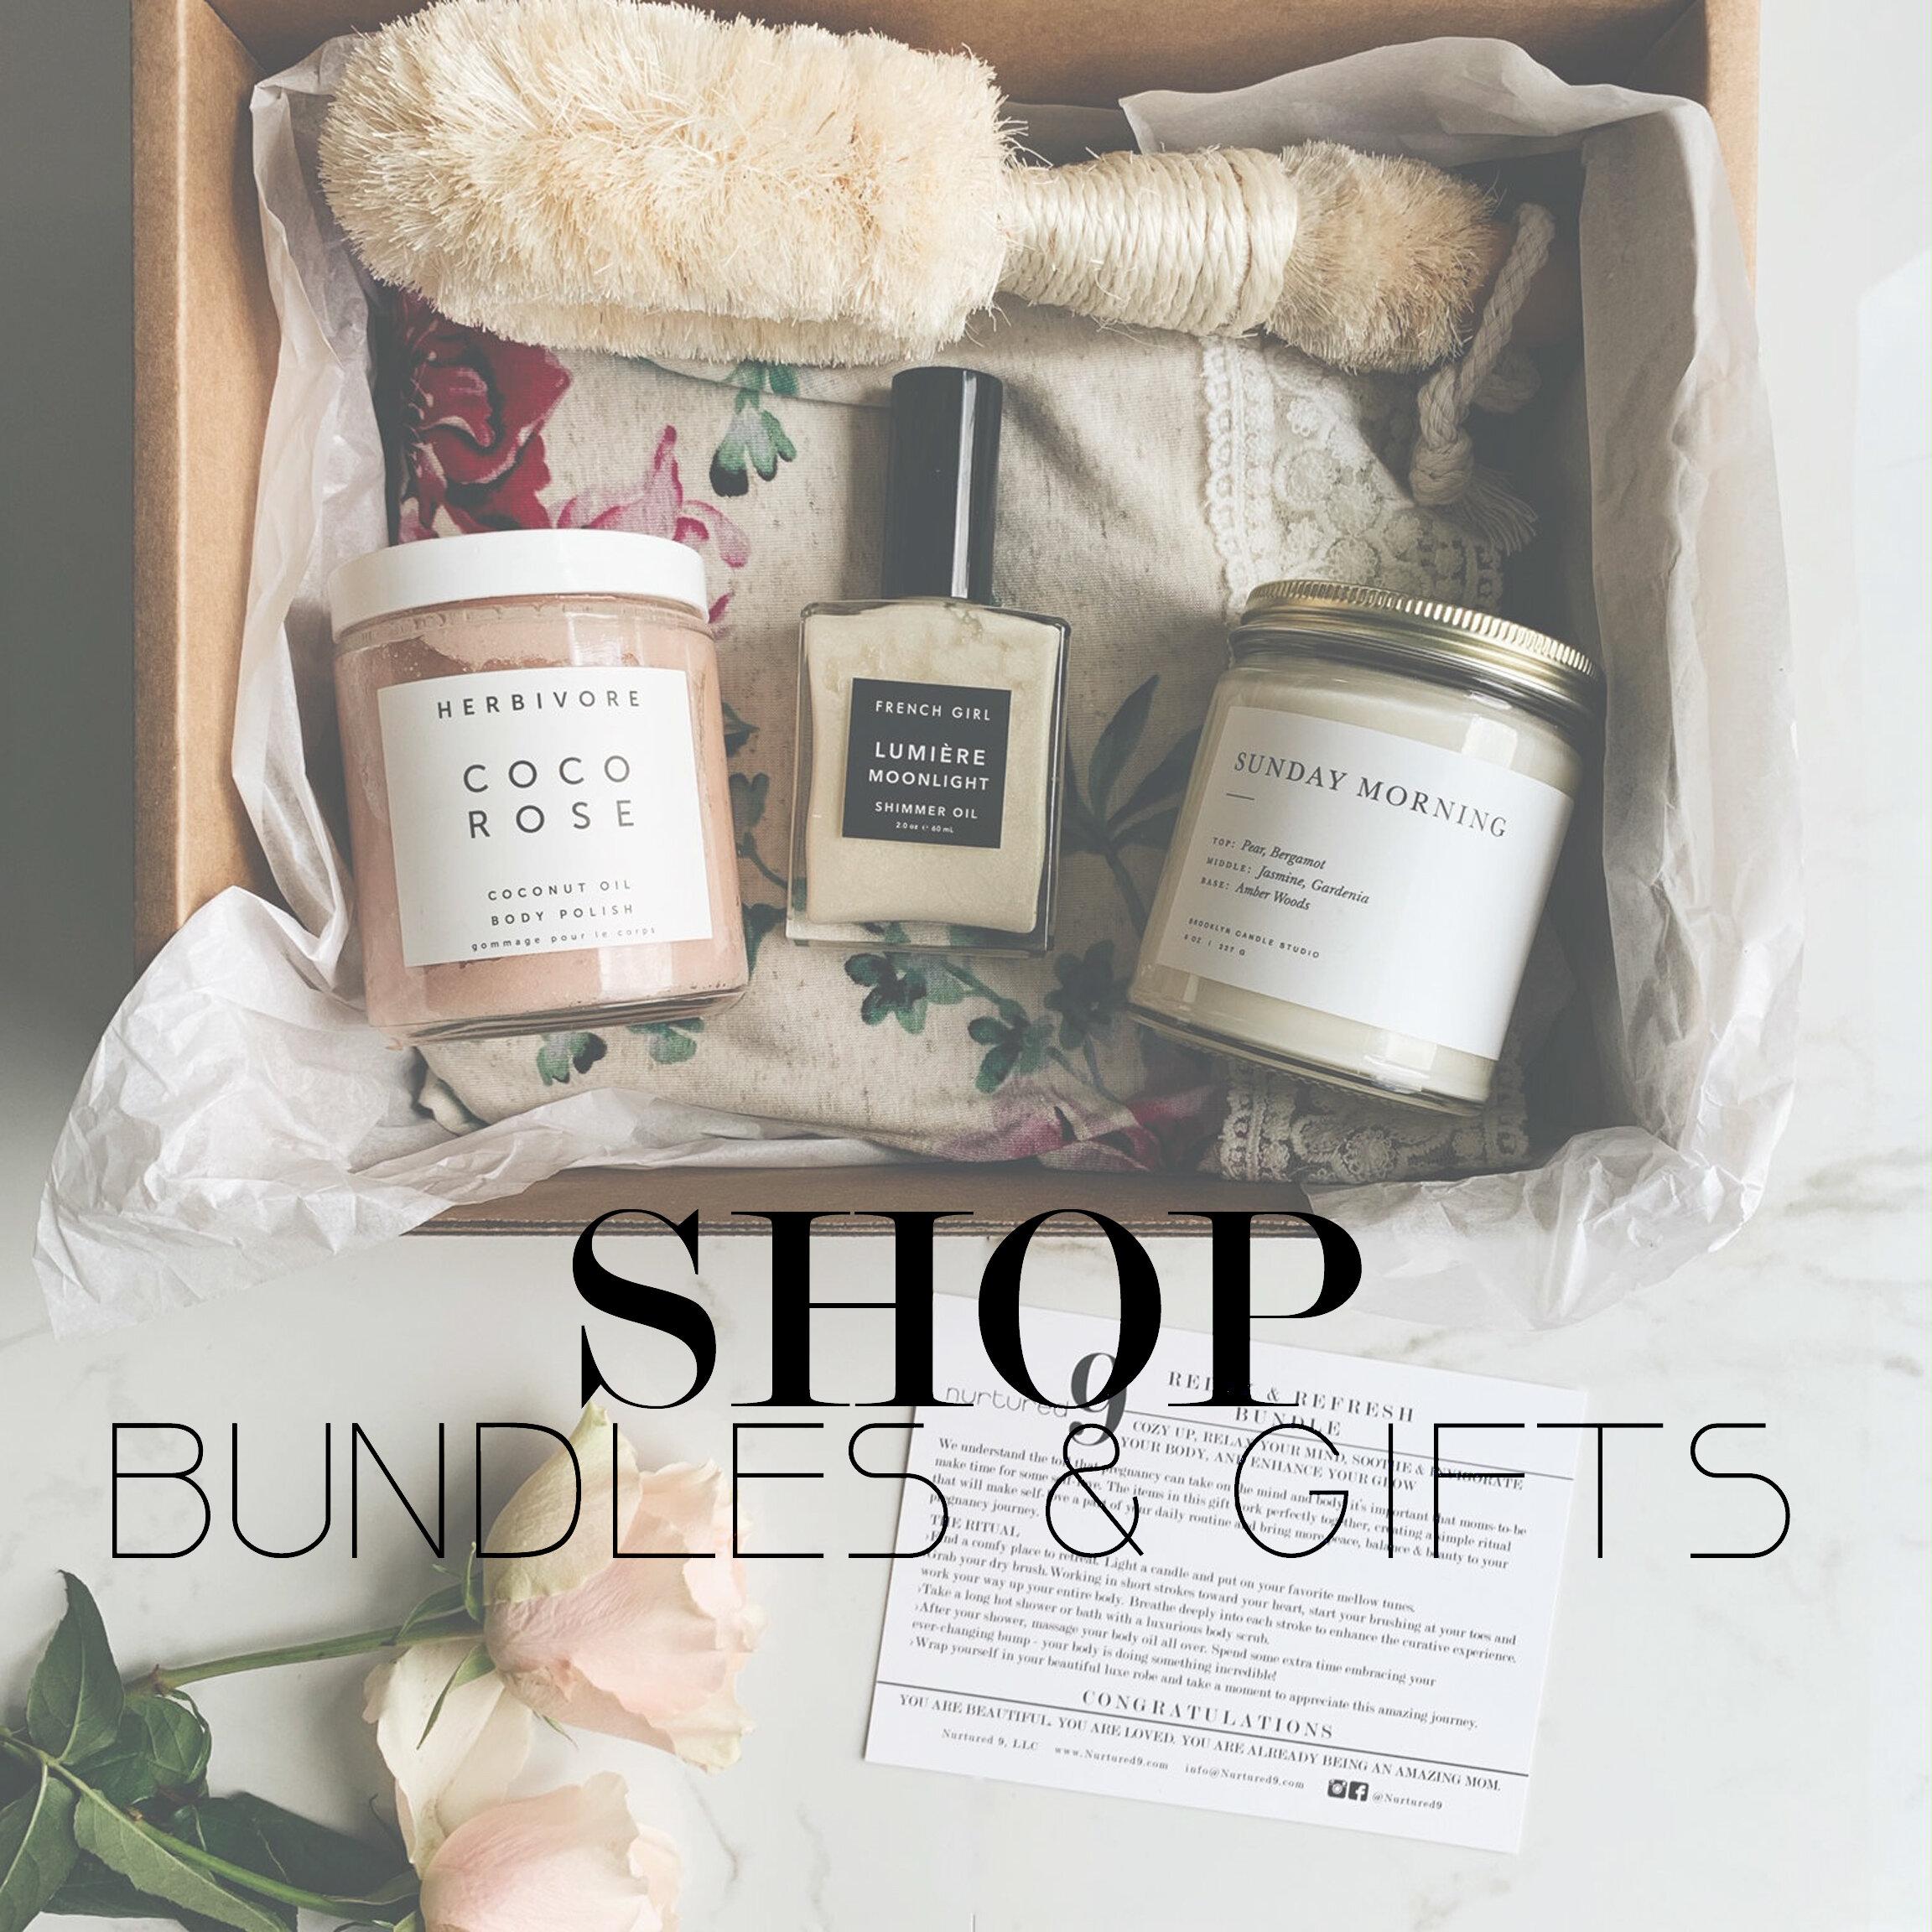 shop bundles and gifts.jpg